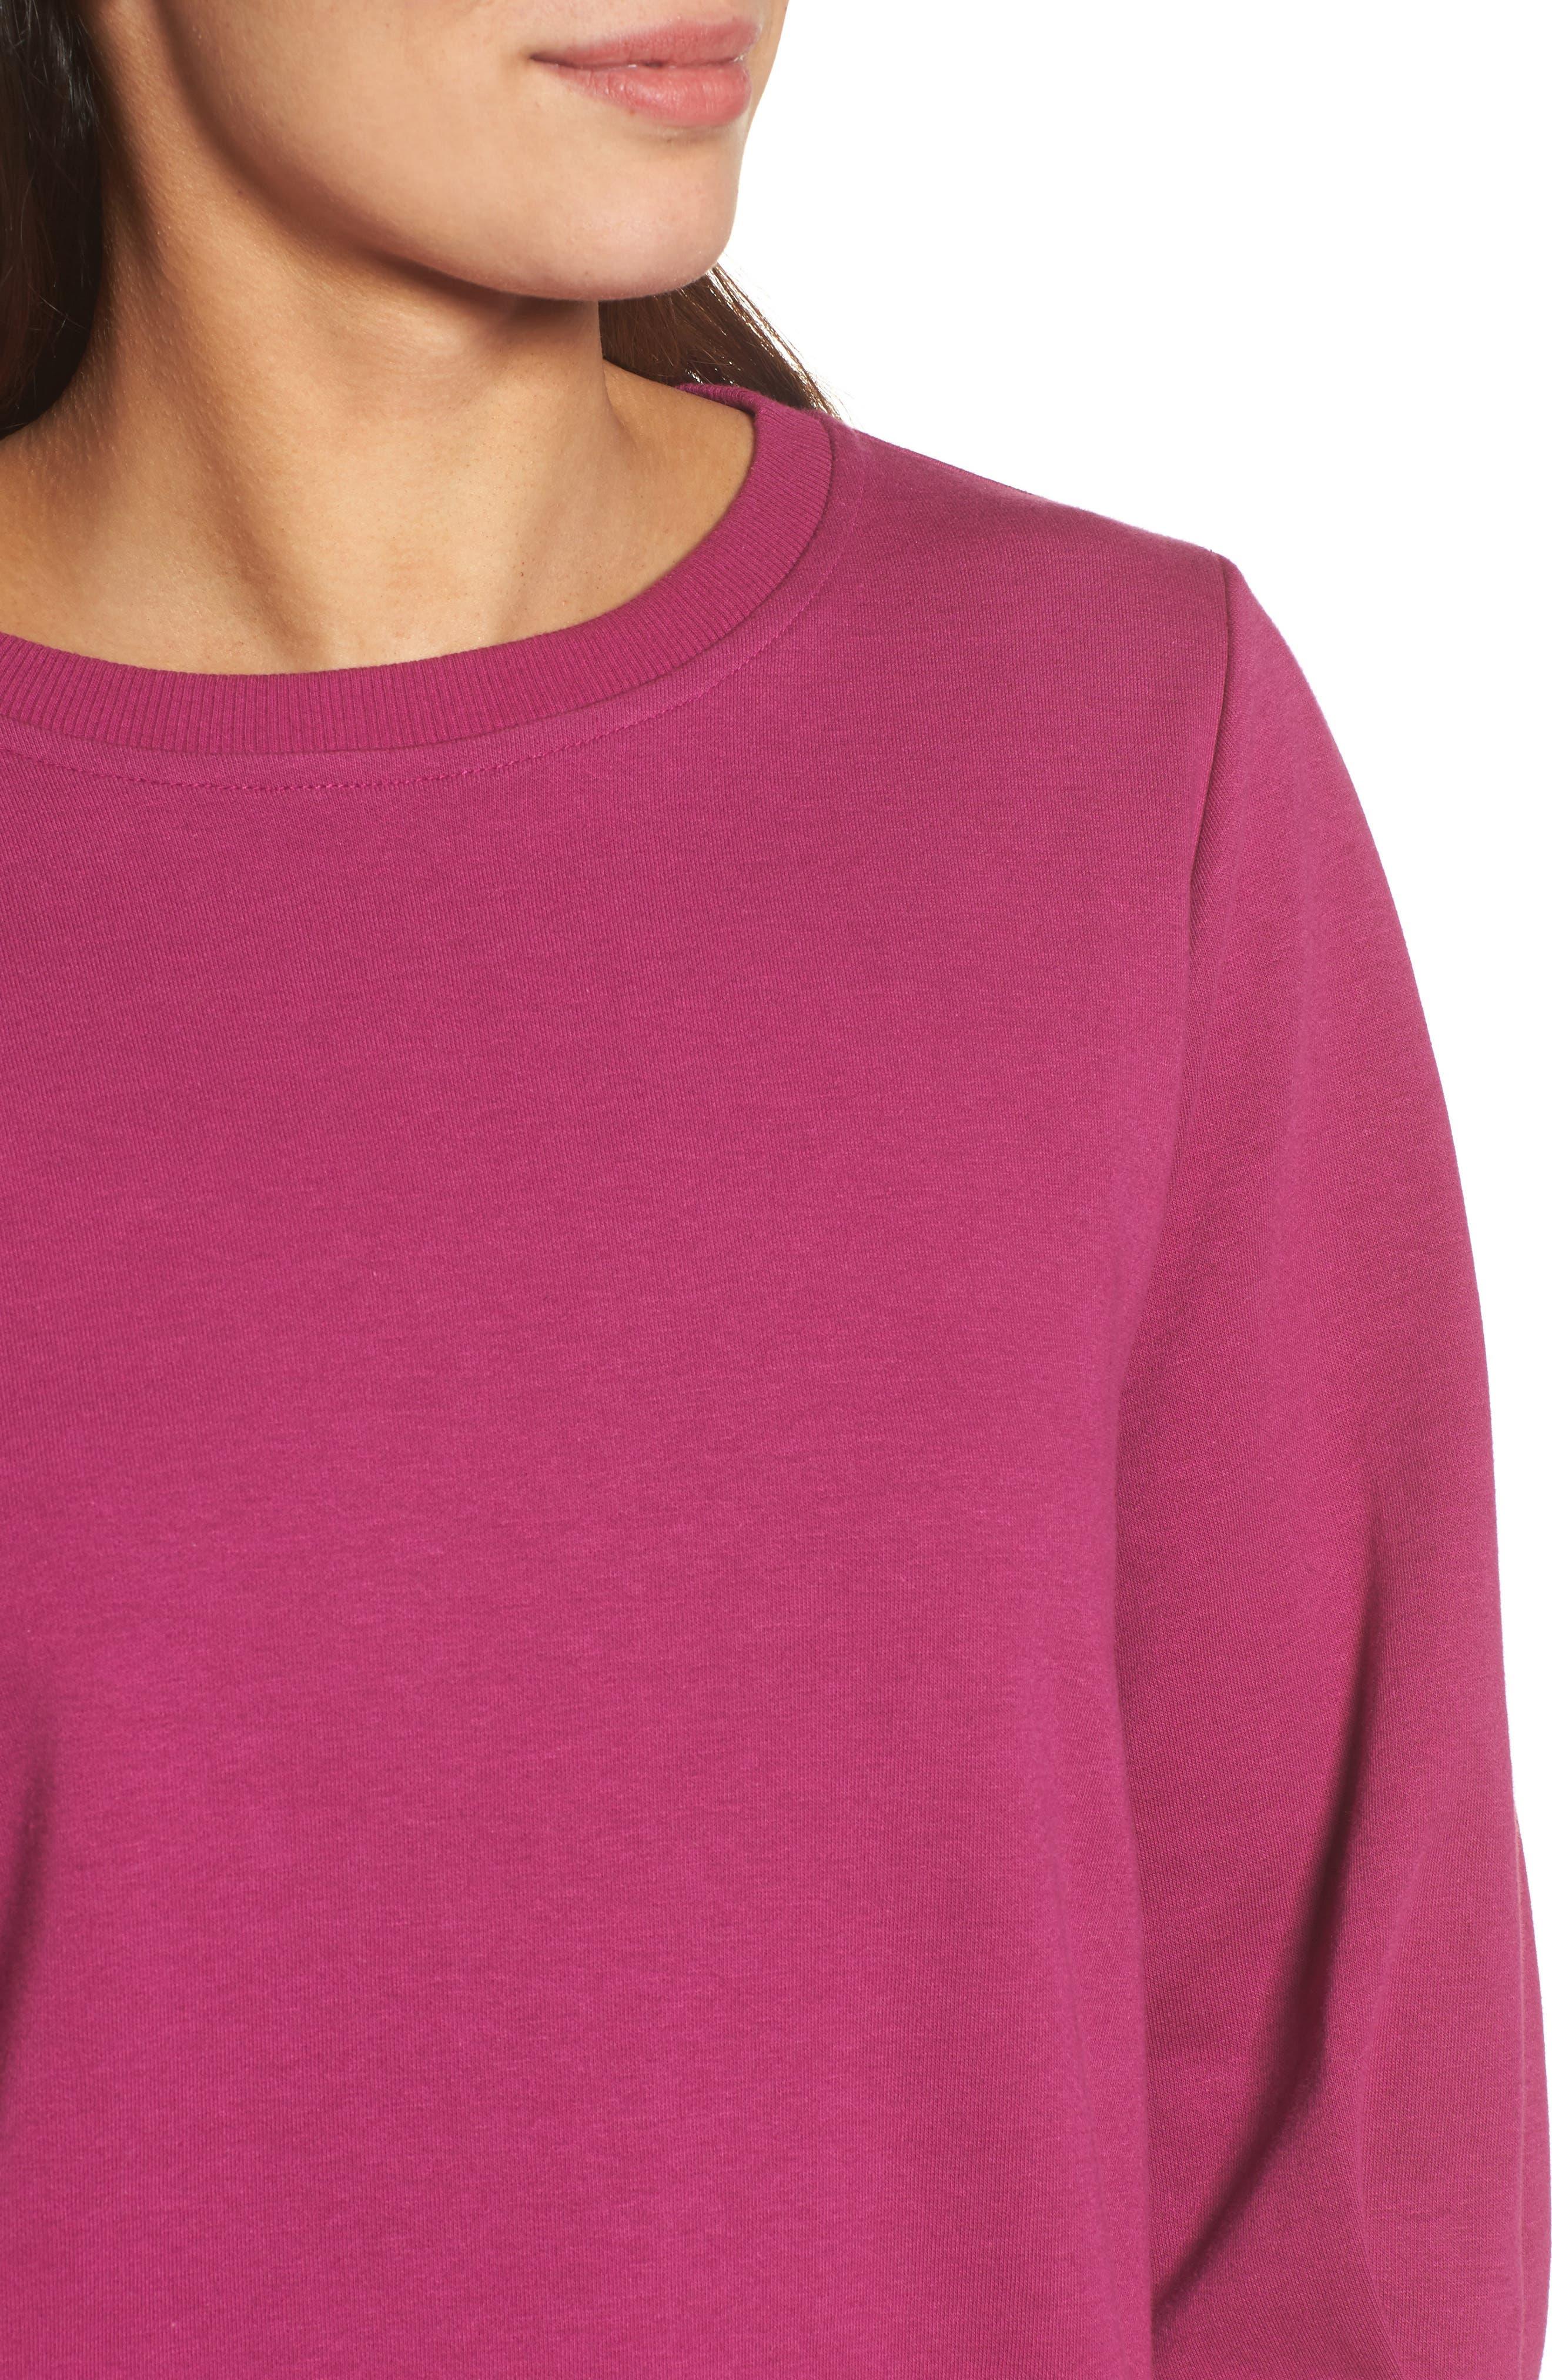 Blouson Sleeve Sweatshirt,                             Alternate thumbnail 20, color,